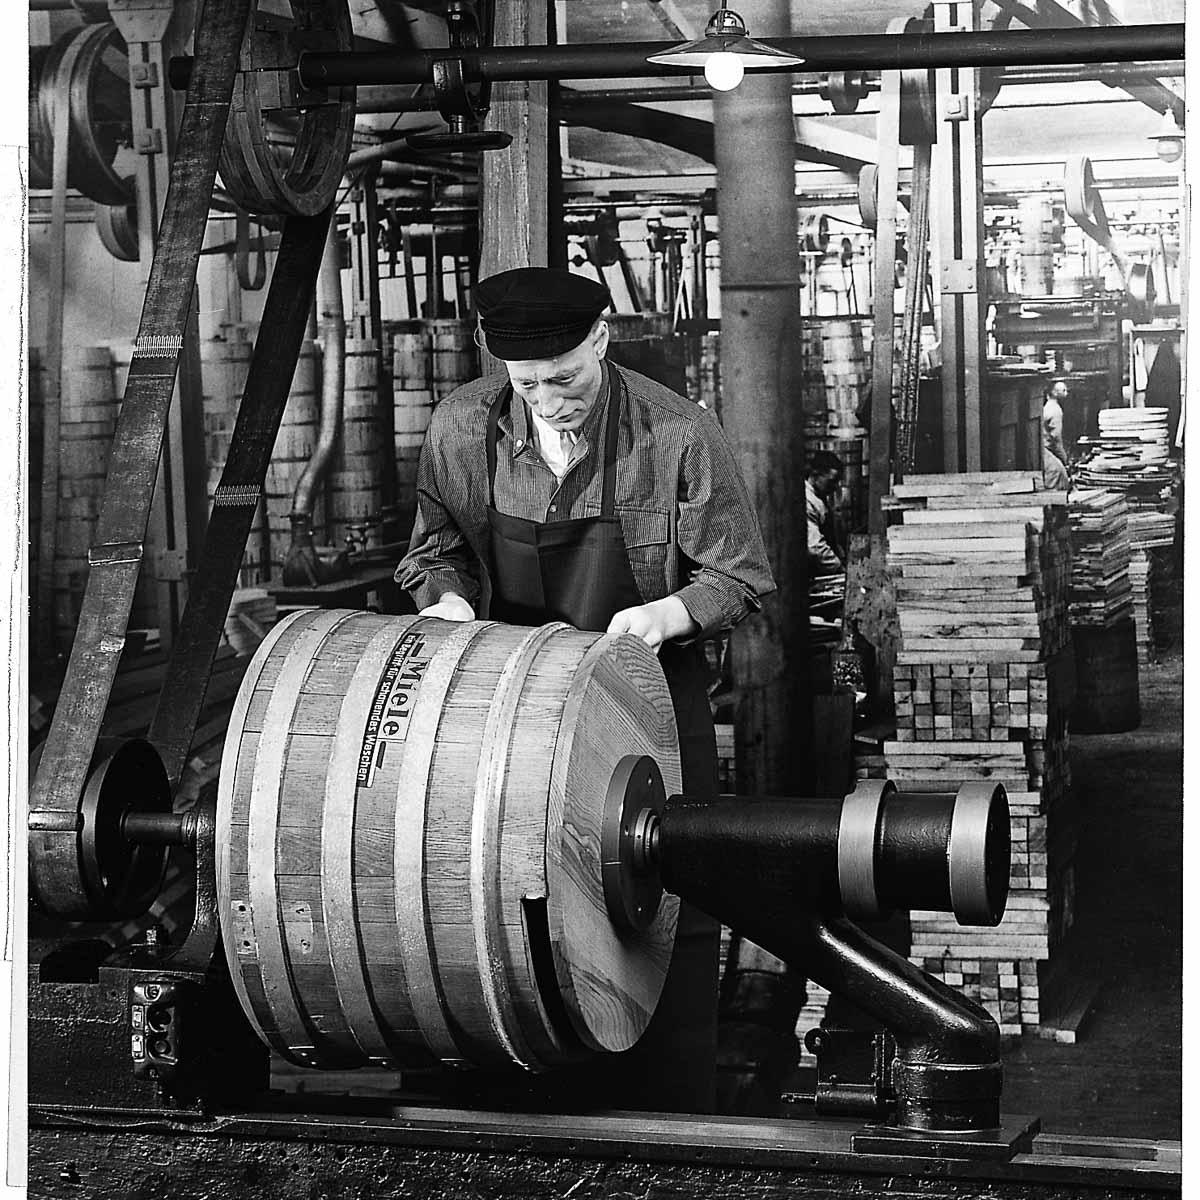 Traditionsmarke Miele Fabrik um die Jahrhundertwende